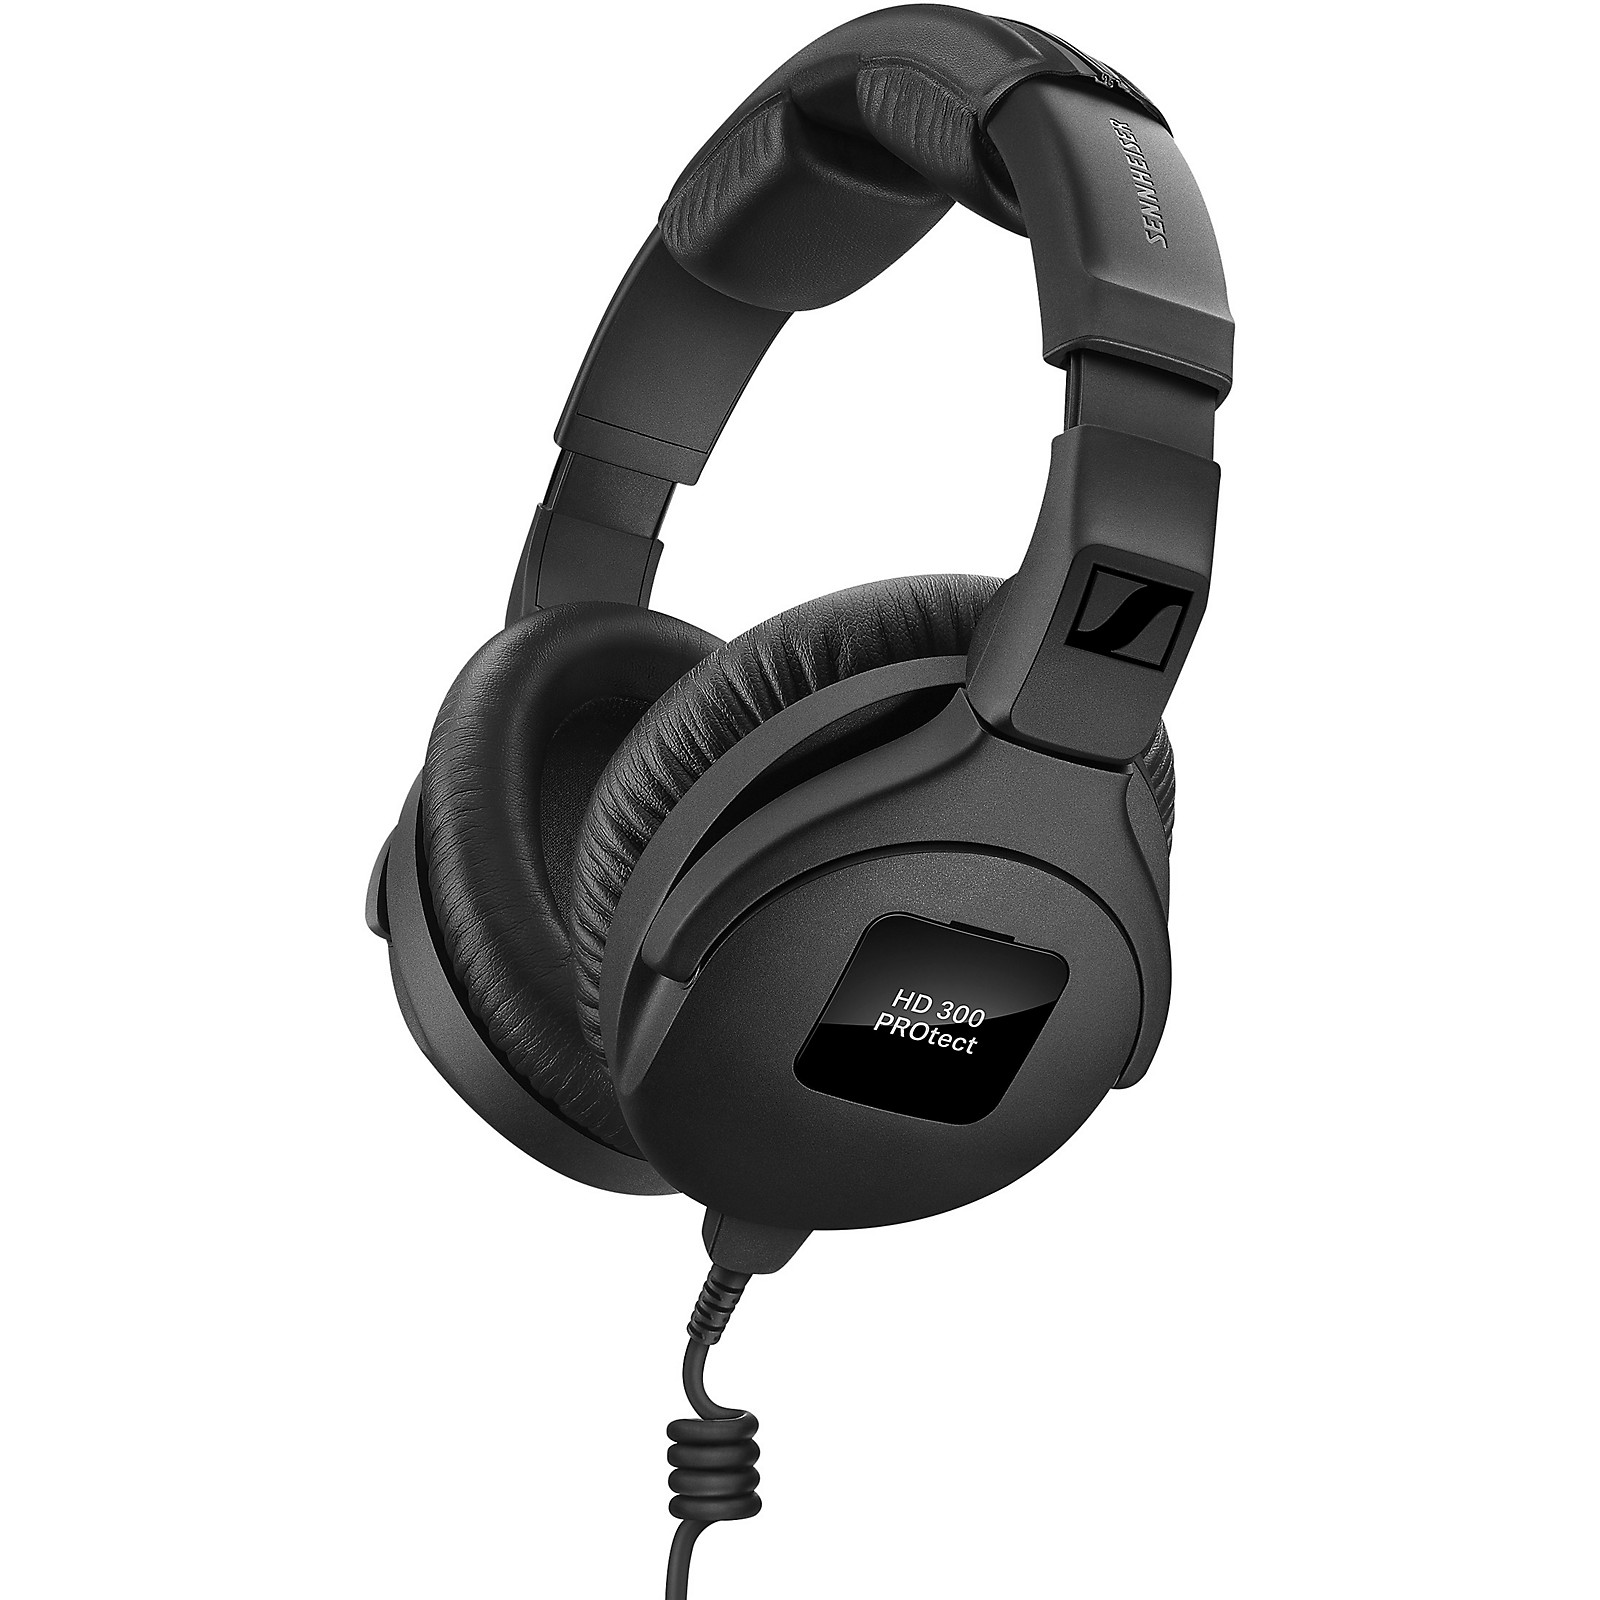 Sennheiser HD 300 PROtect Studio Monitoring Headphones